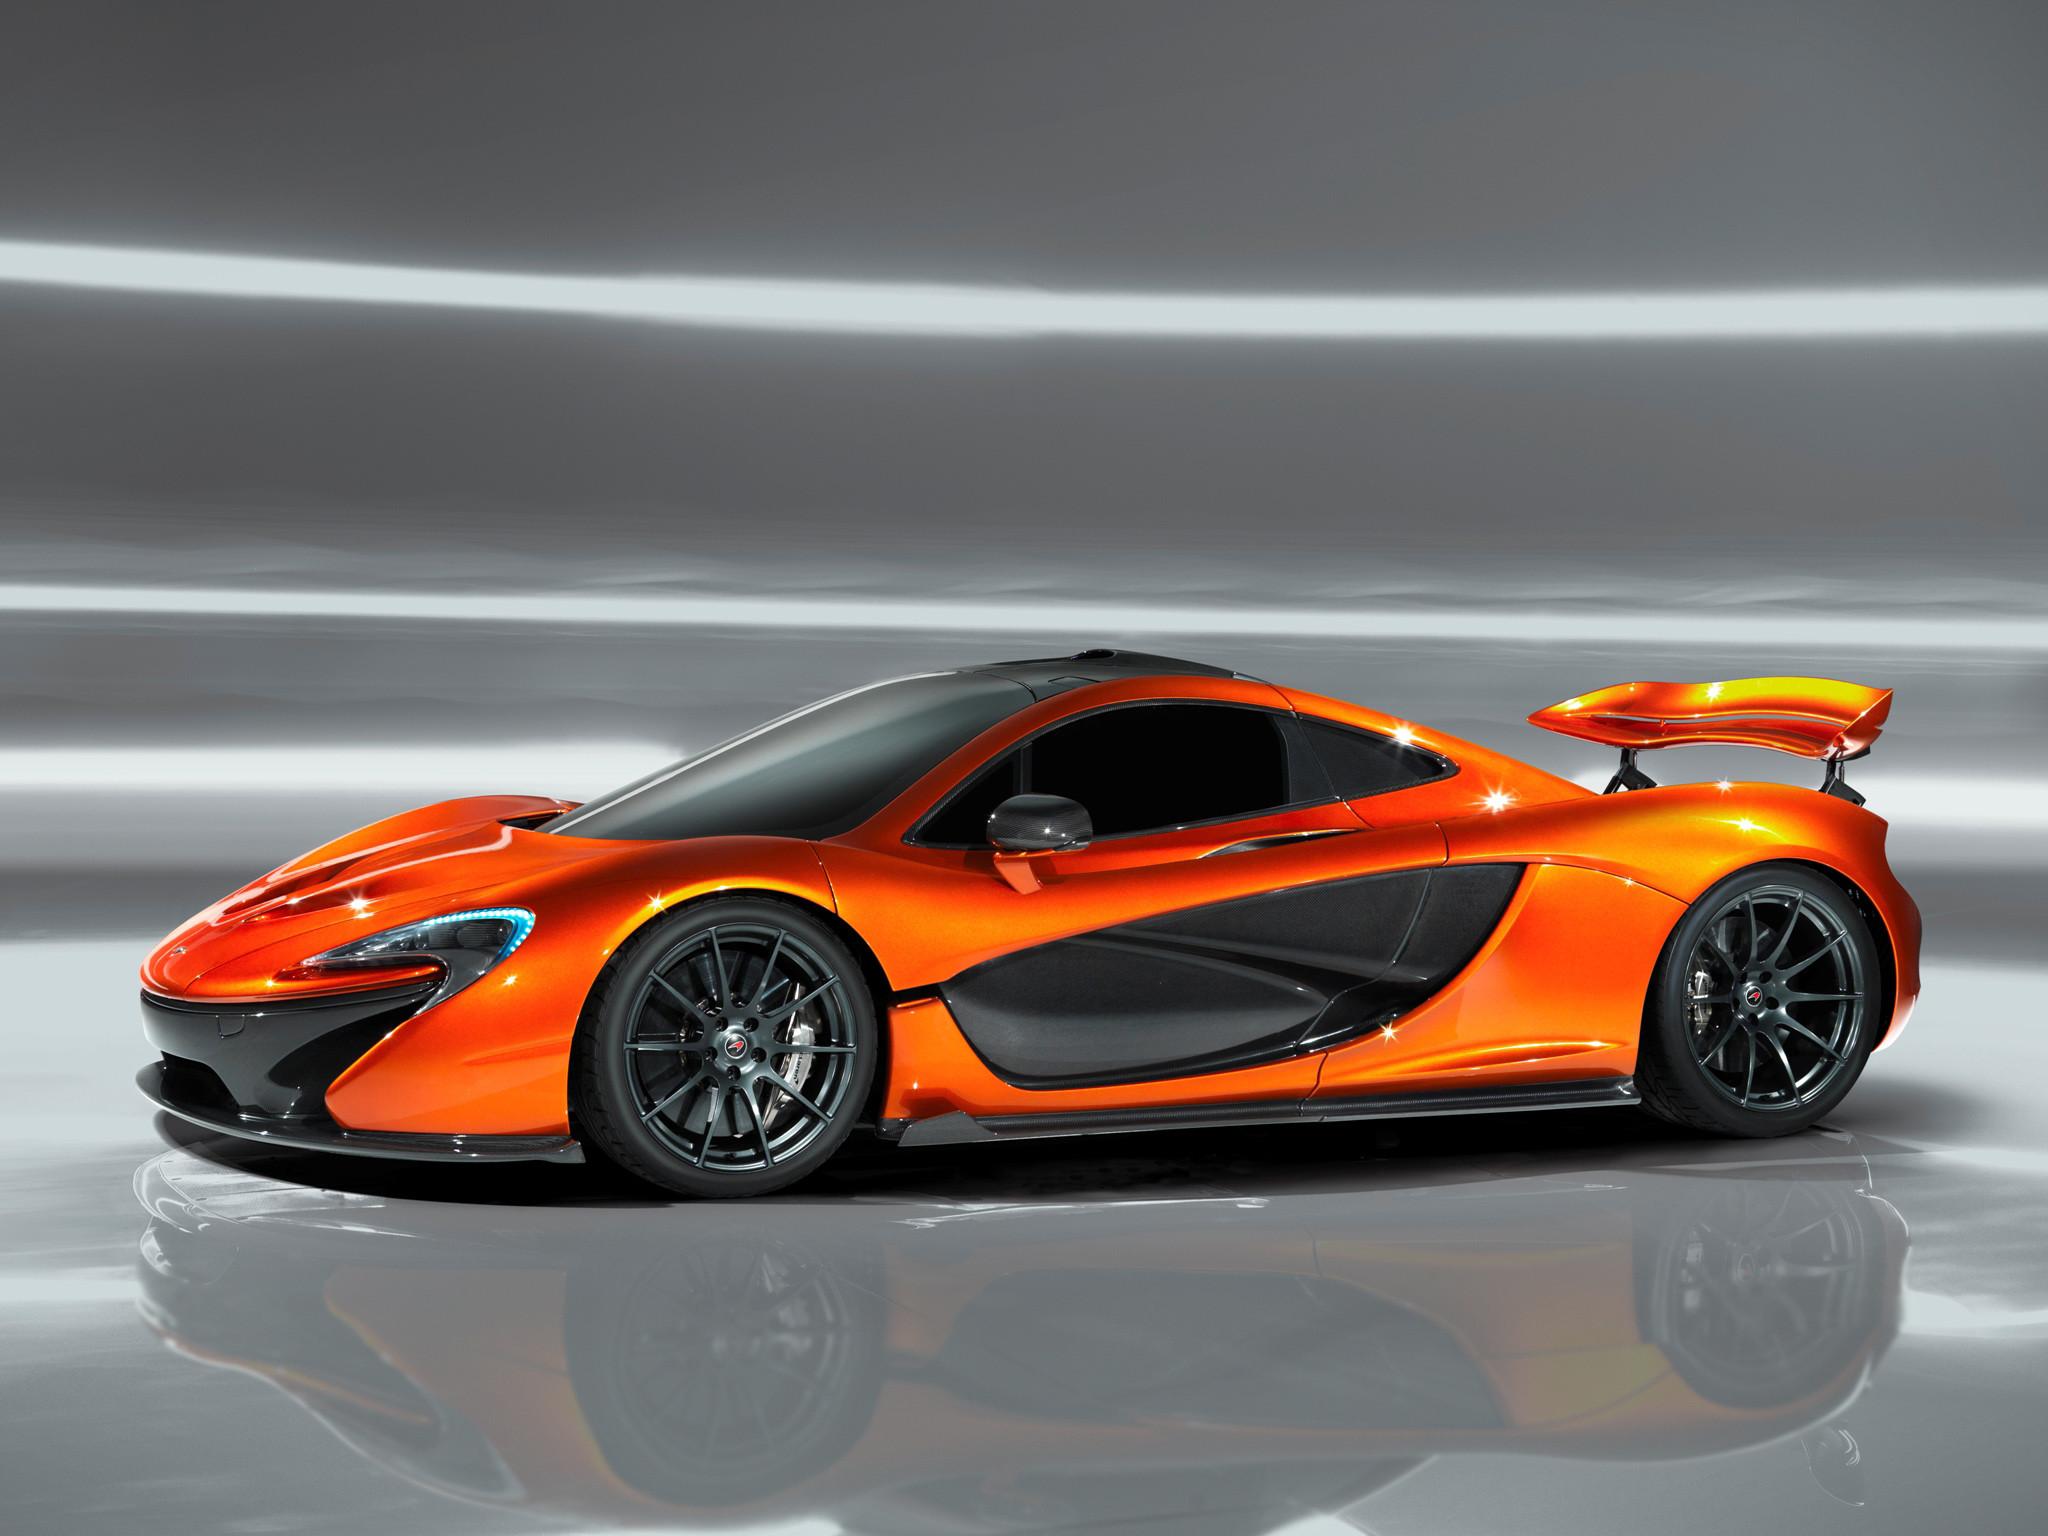 McLaren P1 Orange Wallpaper